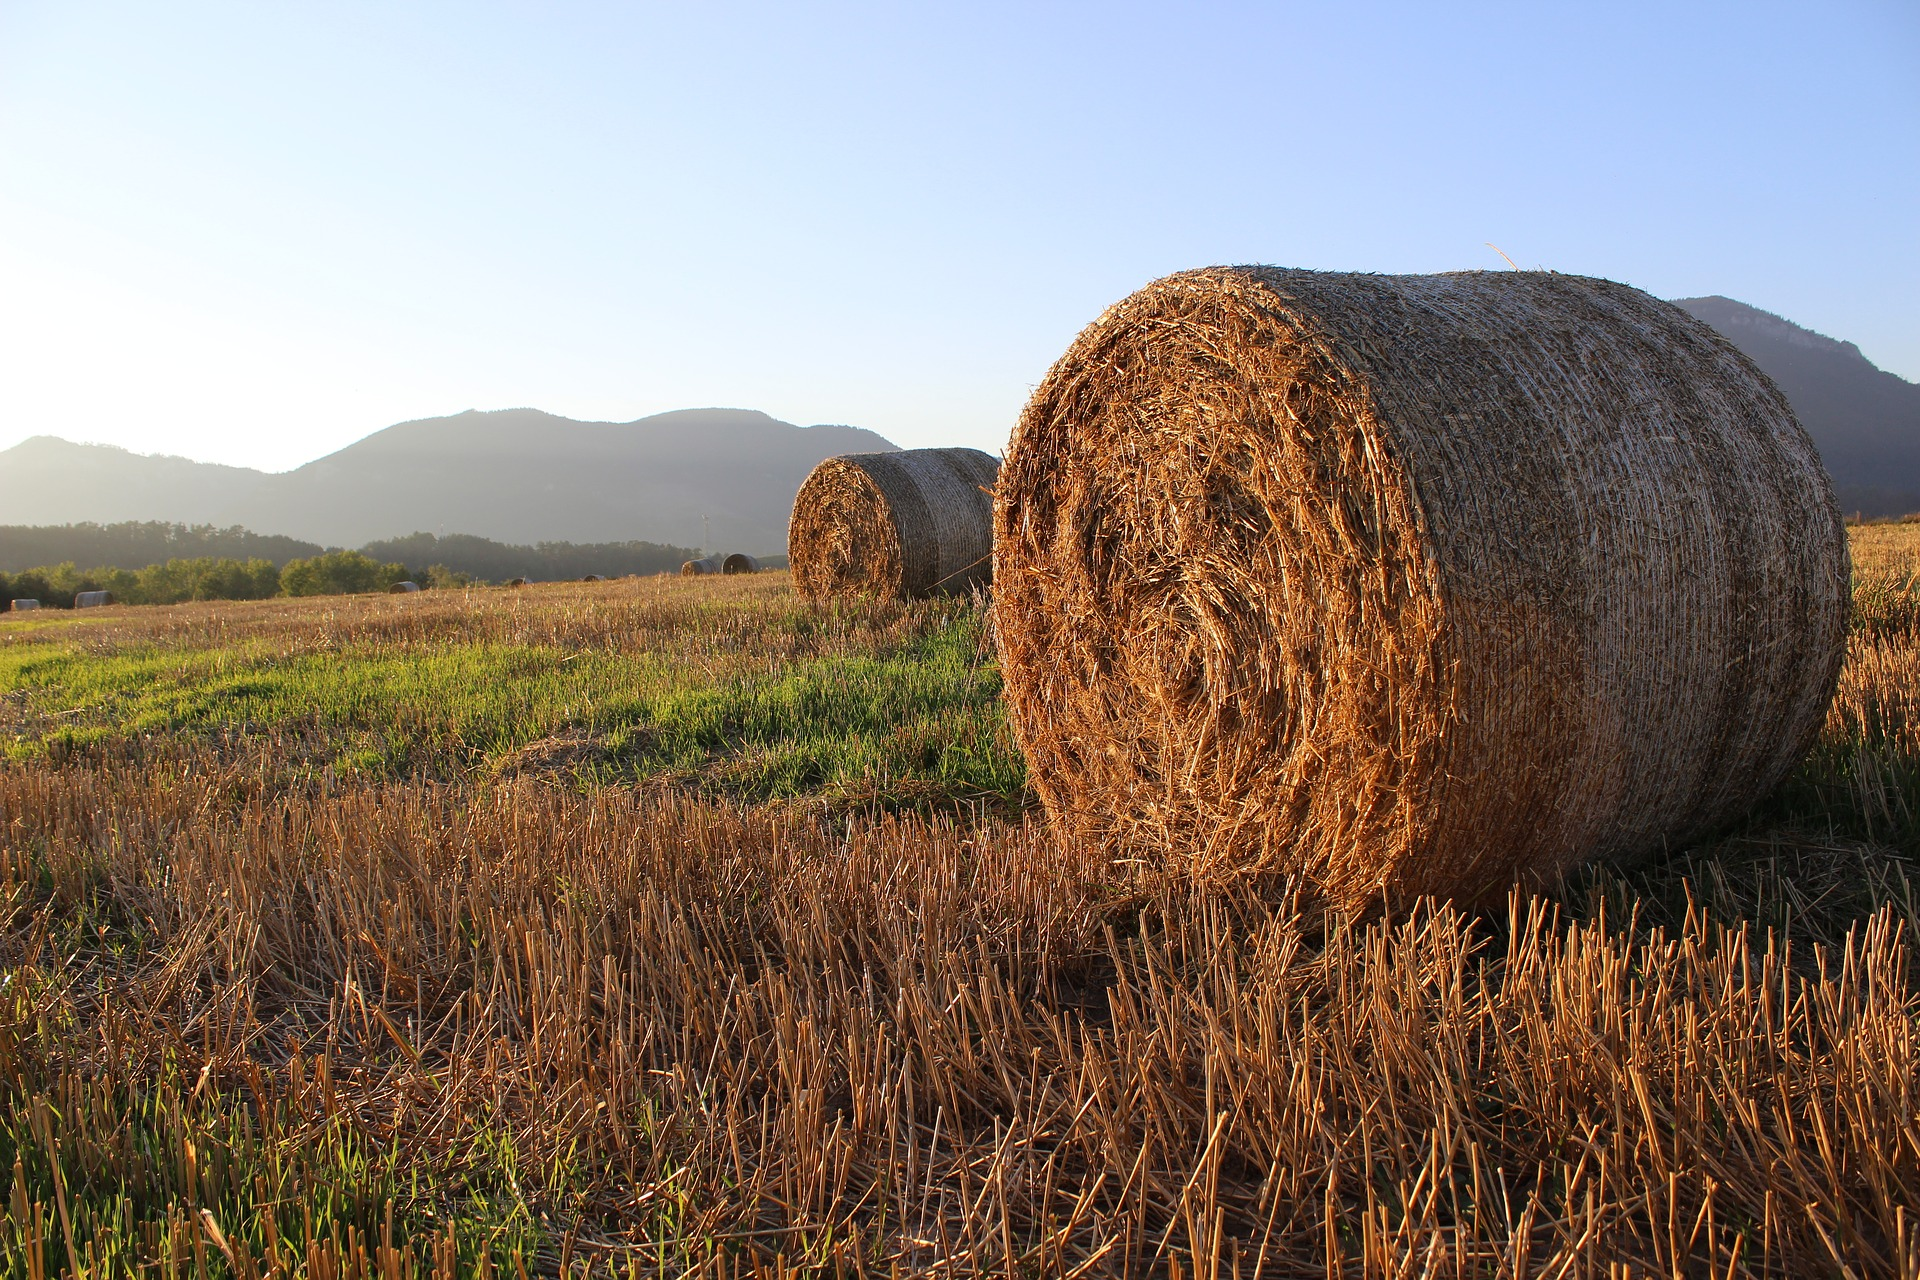 Ukraїnśkyj agroholdyng investuje 4 mln grn u kooperatyvy